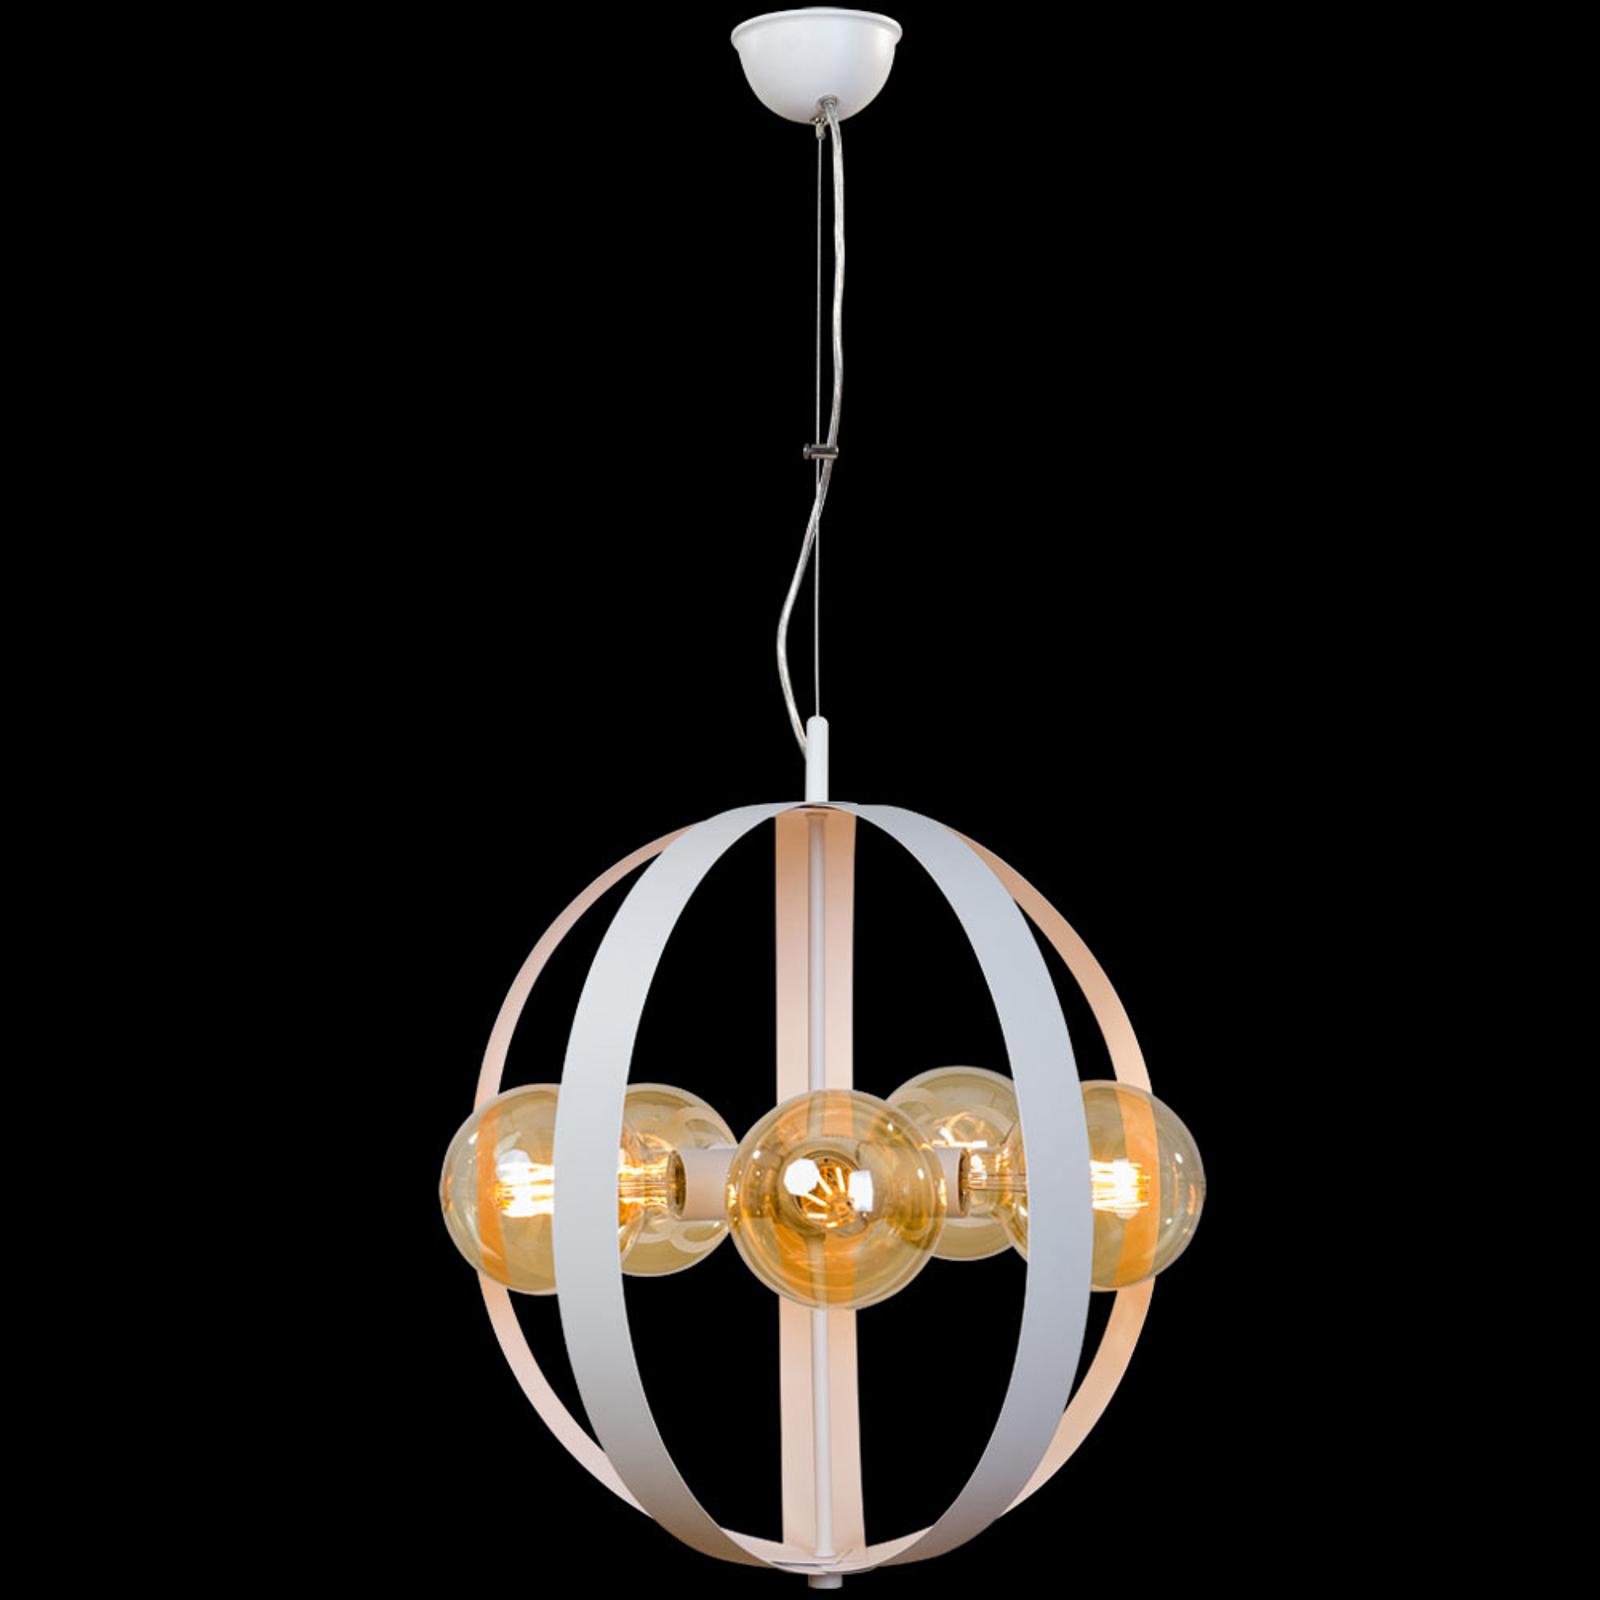 Hanglamp Livia, 5-lamps, wit